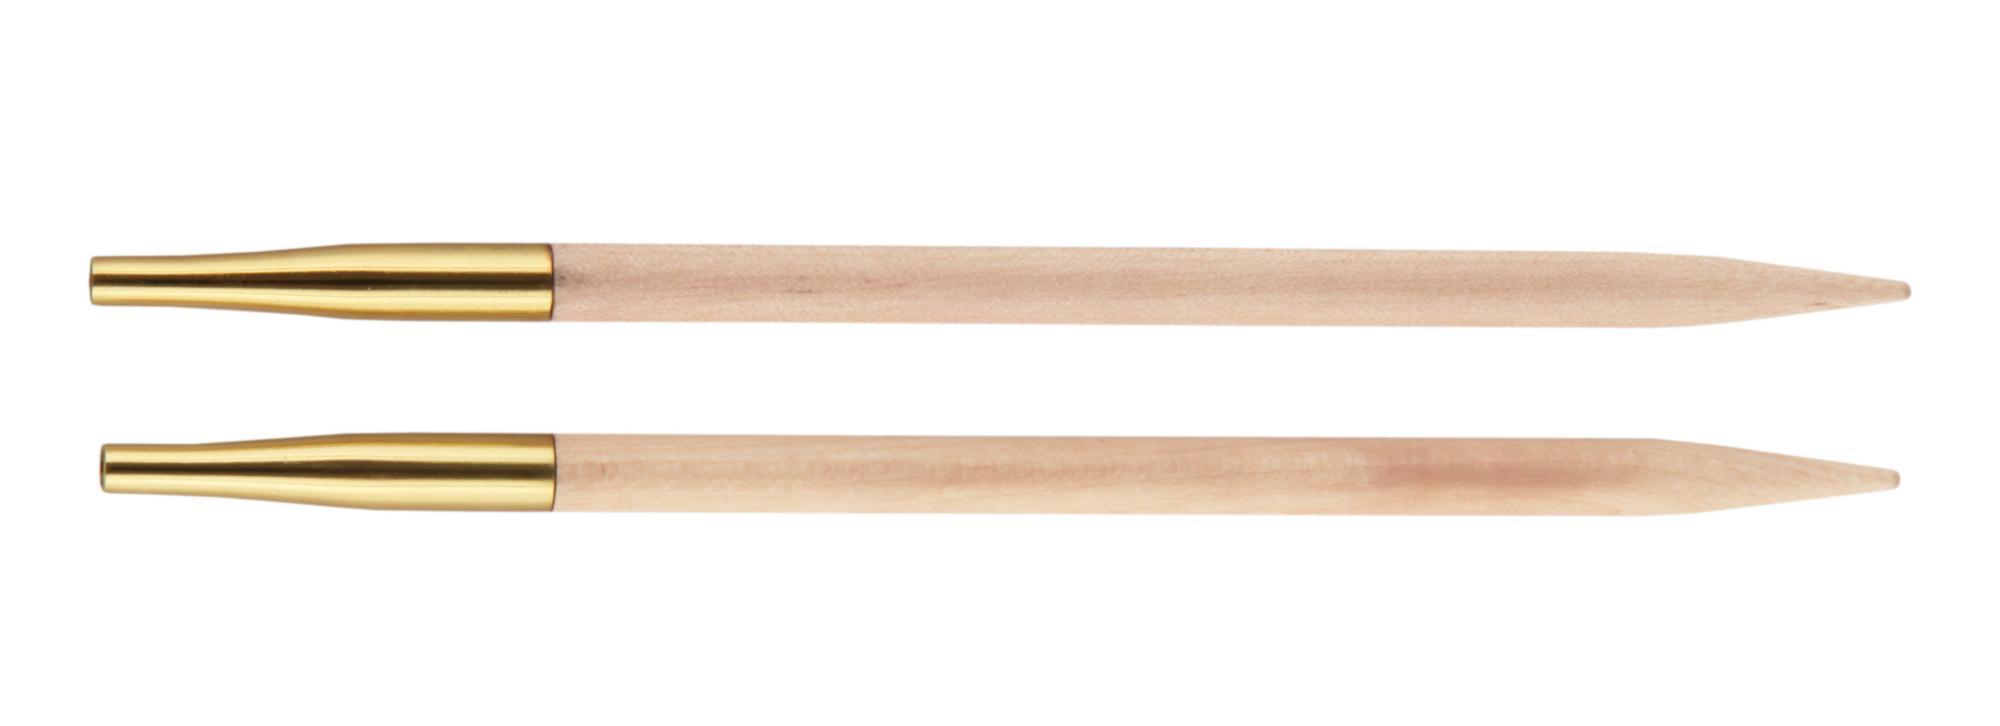 Спицы съемные короткие Basix Birch Wood KnitPro, 35653, 3.50 мм